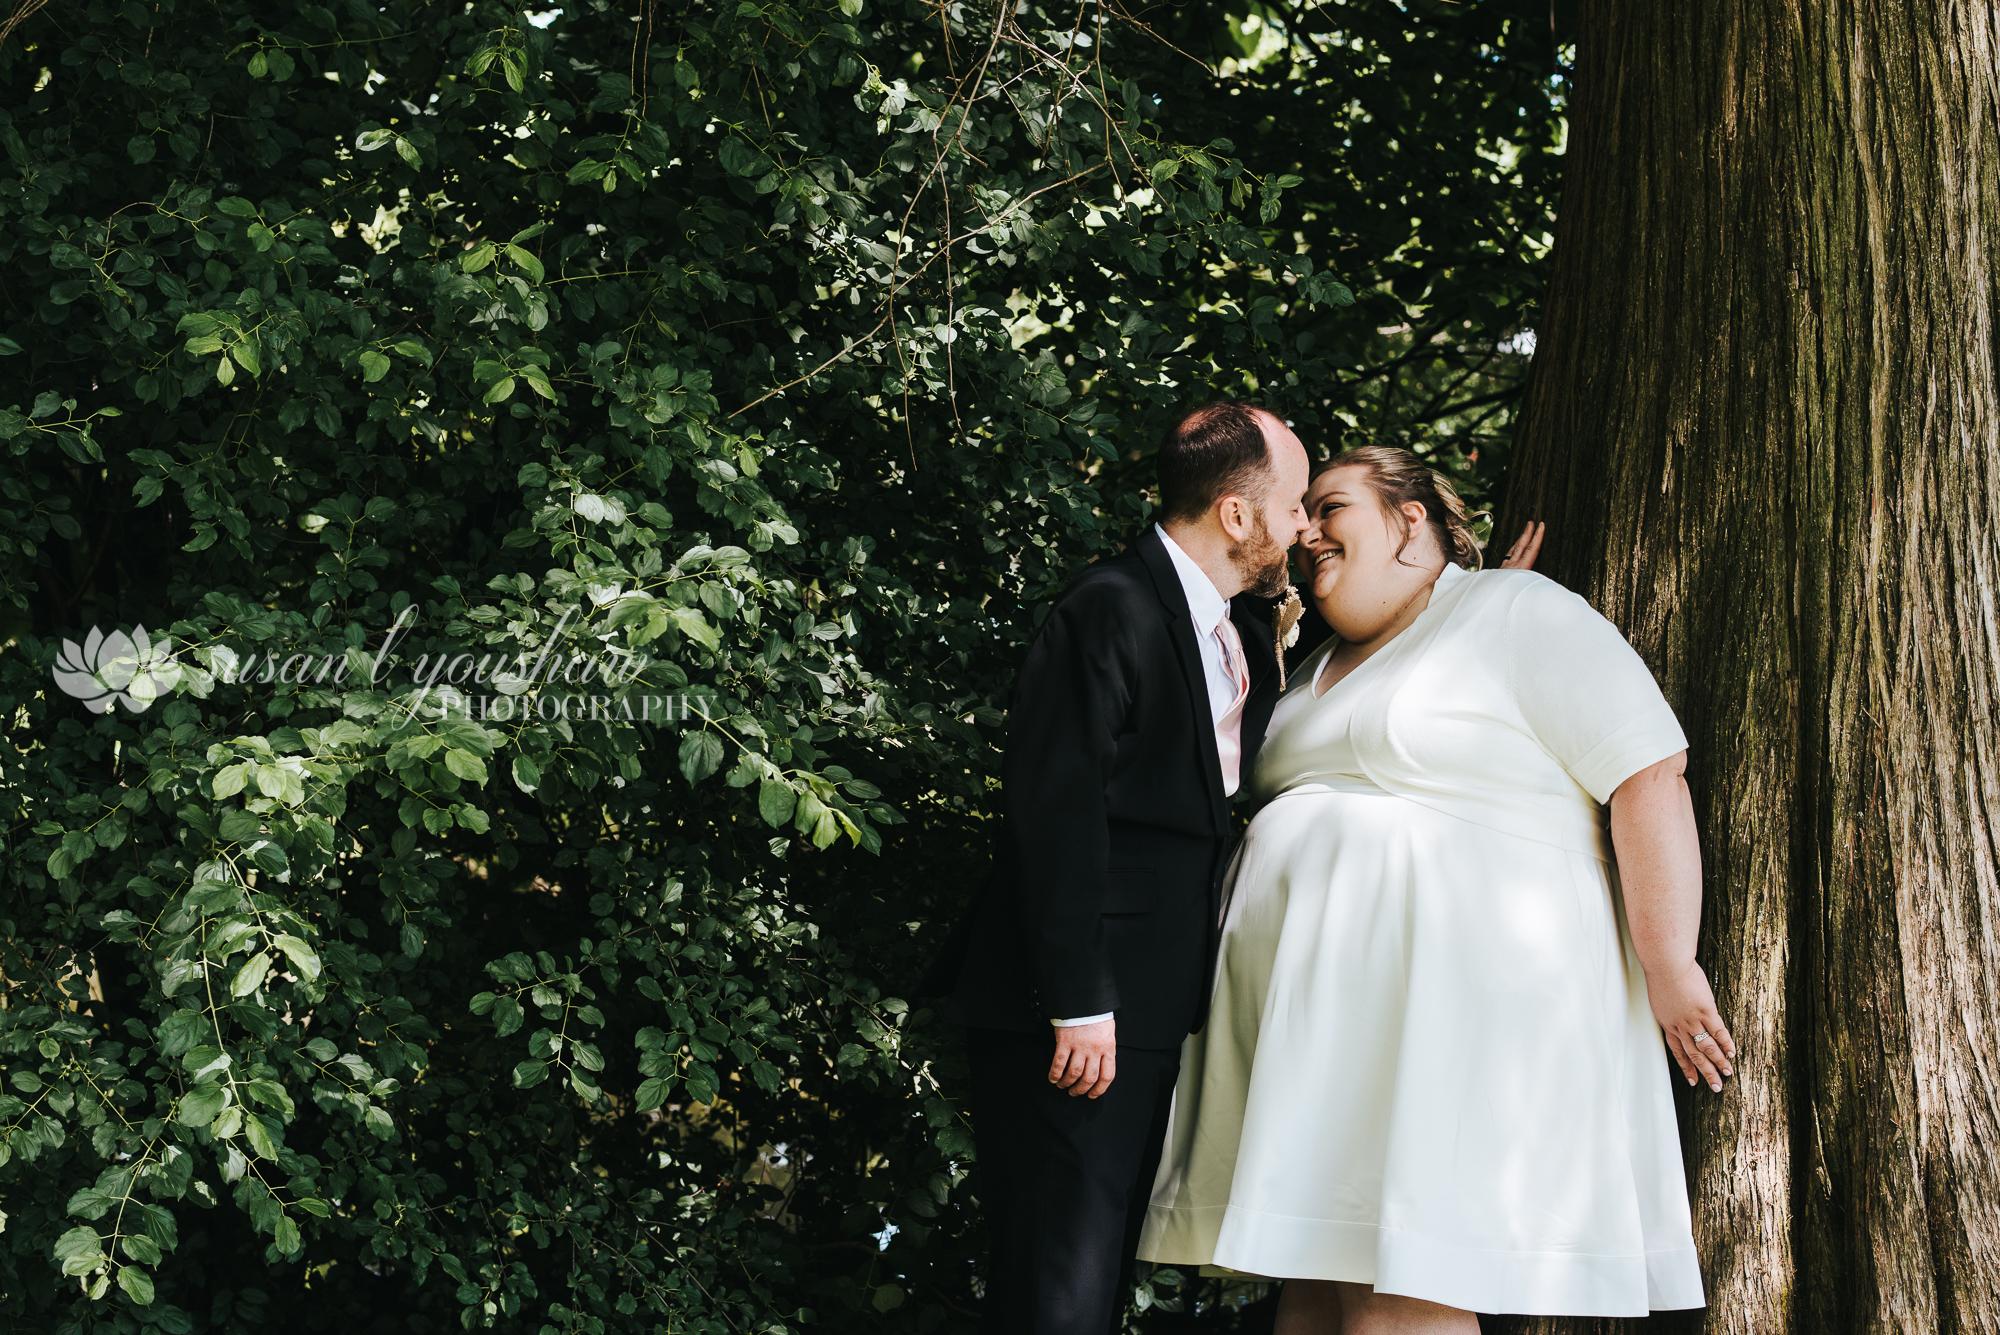 Bill and Sarah Wedding Photos 06-08-2019 SLY Photography -59.jpg